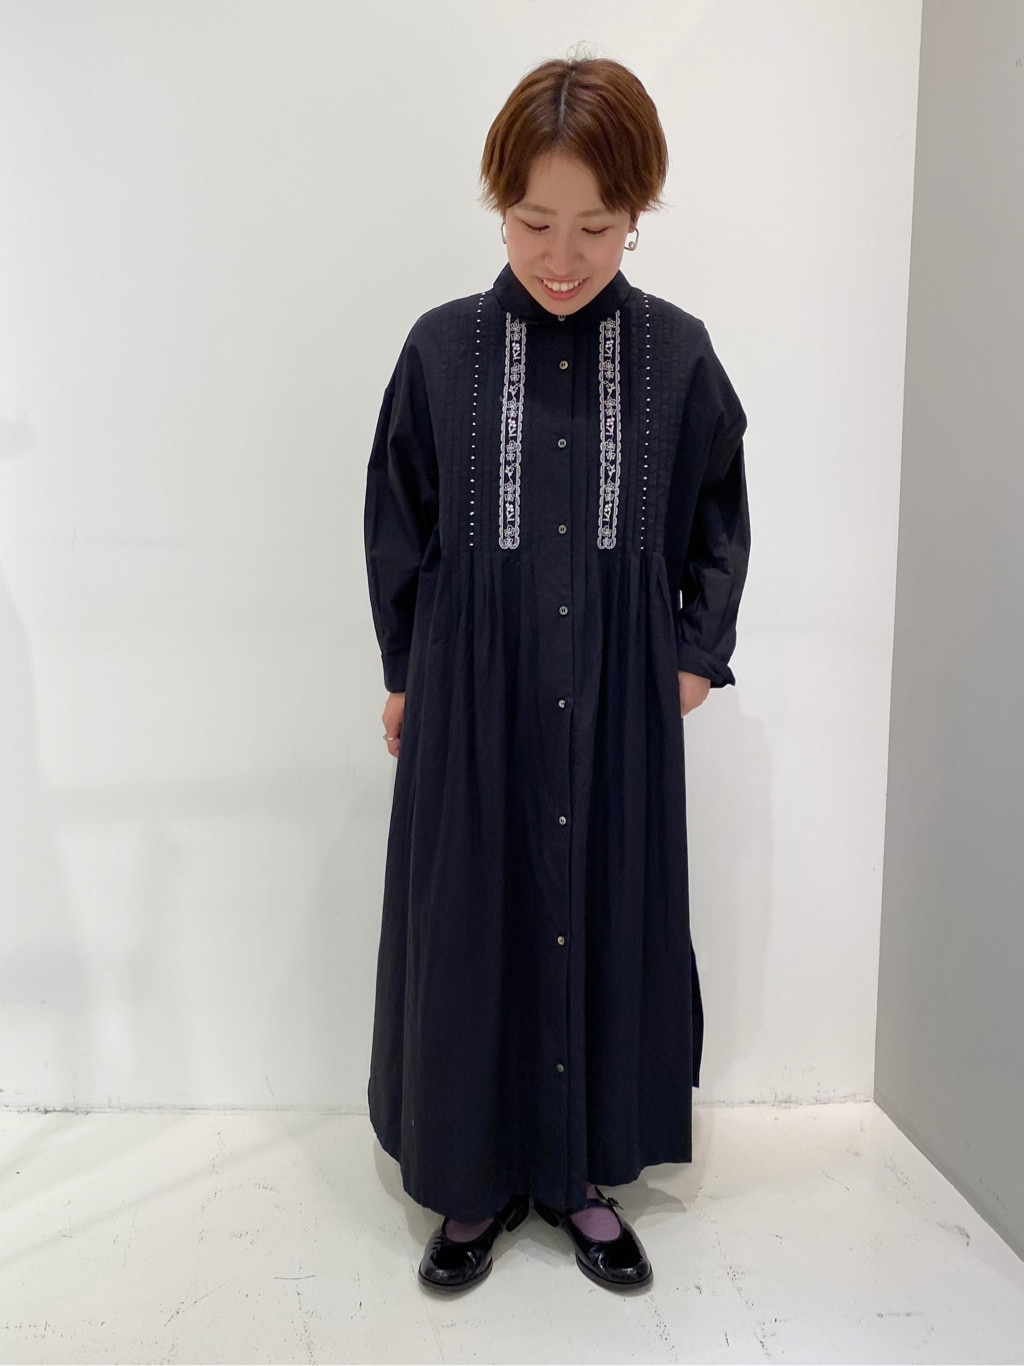 bulle de savon なんばシティ 身長:148cm 2020.11.30